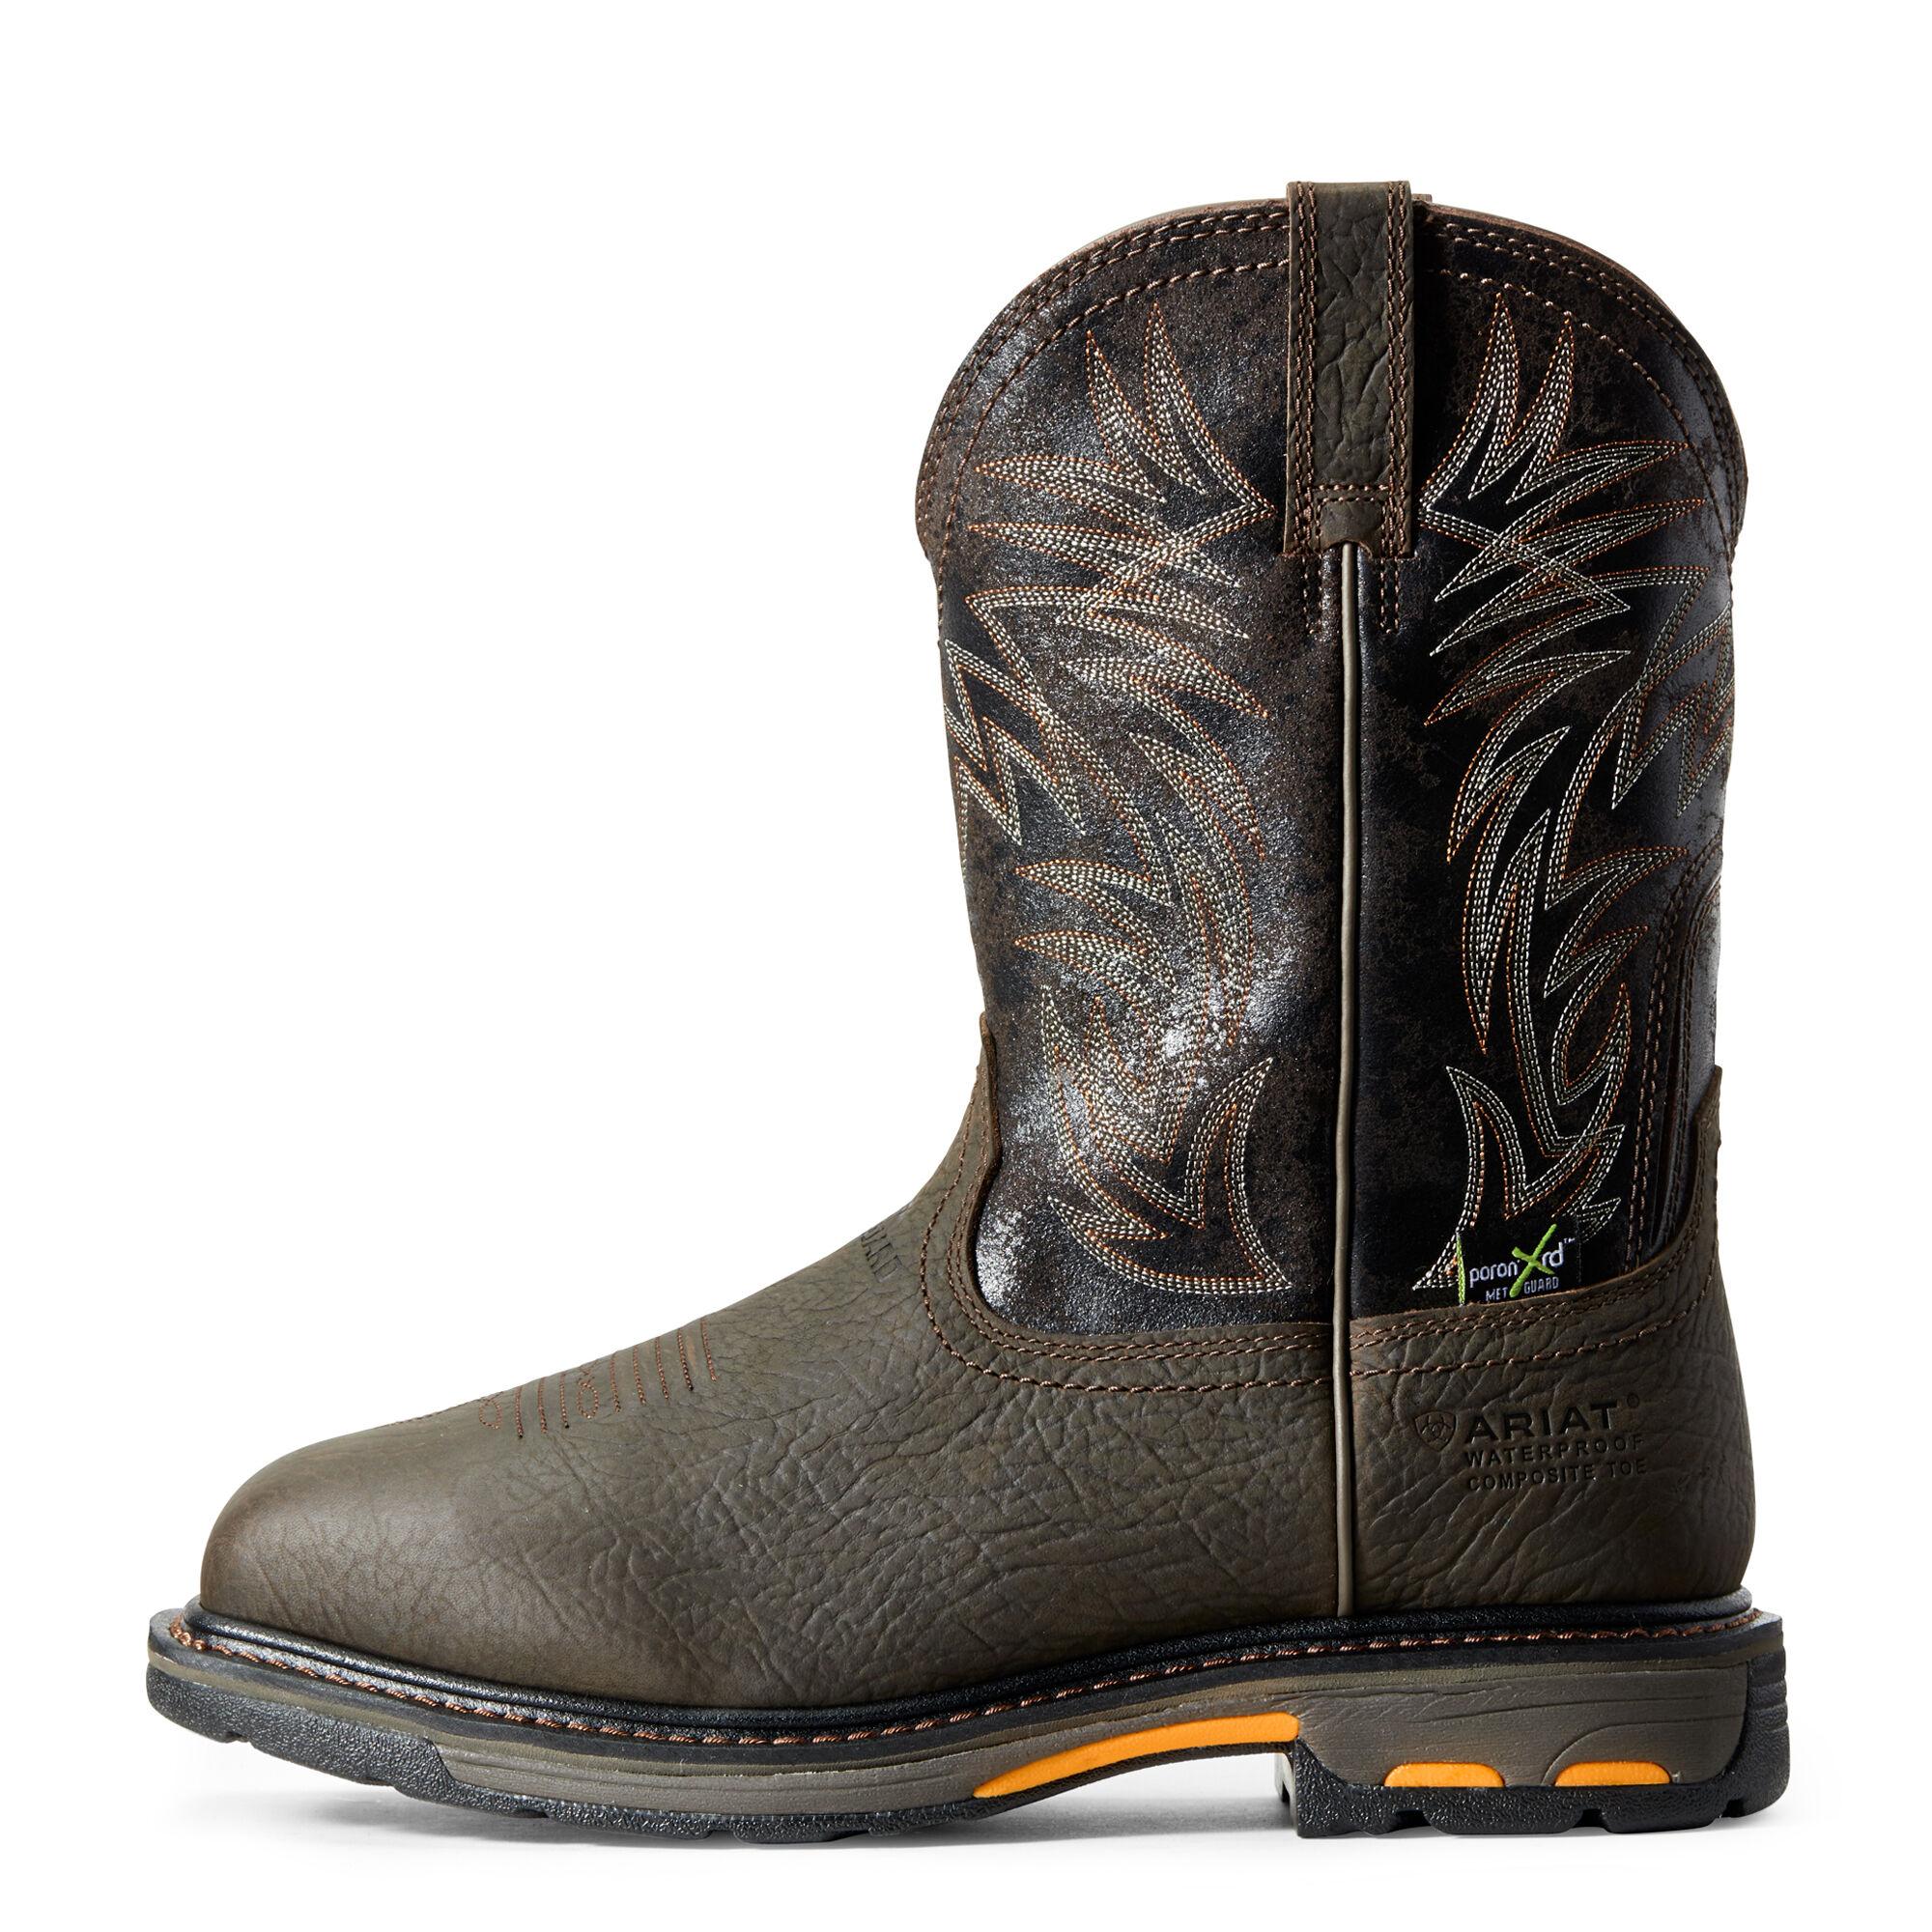 0f96d363bc8 WorkHog Wide Square Toe MetGuard Waterproof MetGuard Composite Toe Work Boot